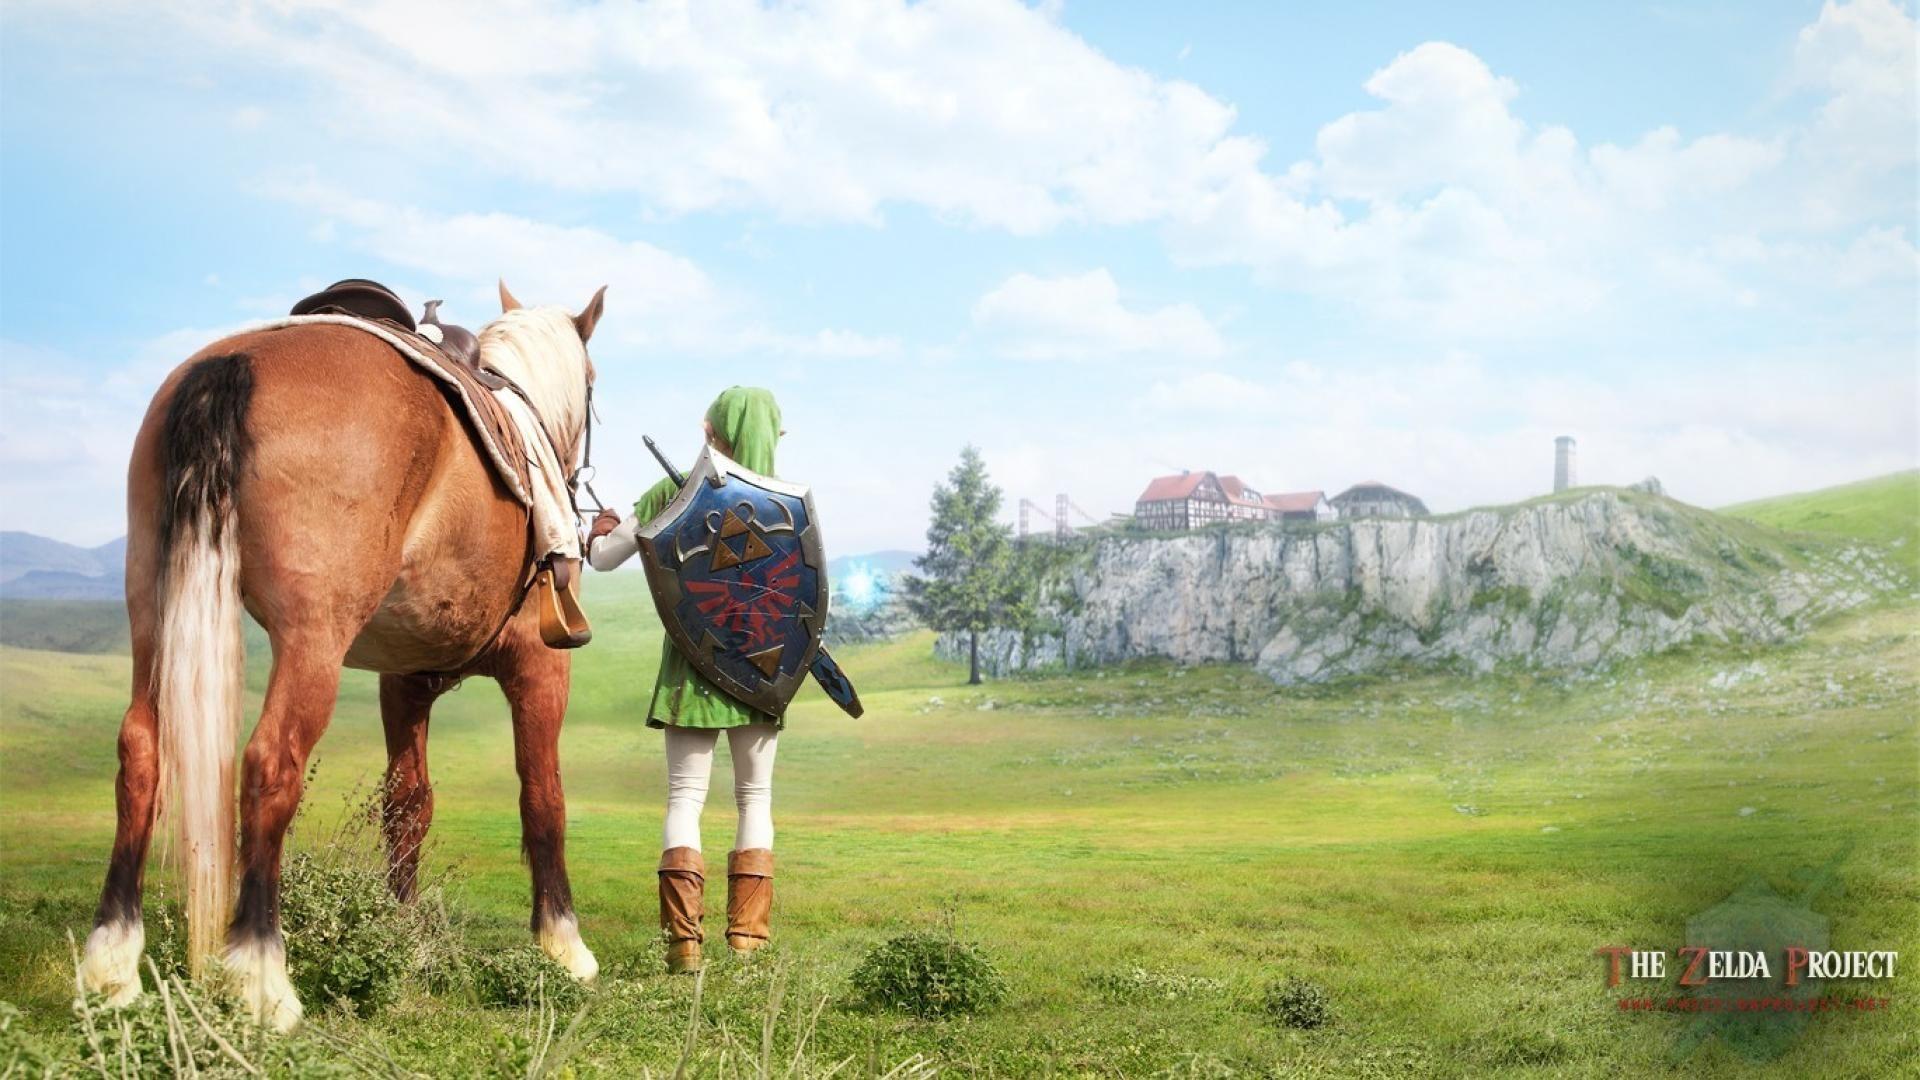 Zelda Ocarina Of Time Screenshots Pictures Wallpapers 1920 1080 Ocarina Of Time 3d Wallpaper 32 Wallpapers Adorabl Legend Of Zelda Ocarina Of Time Zelda